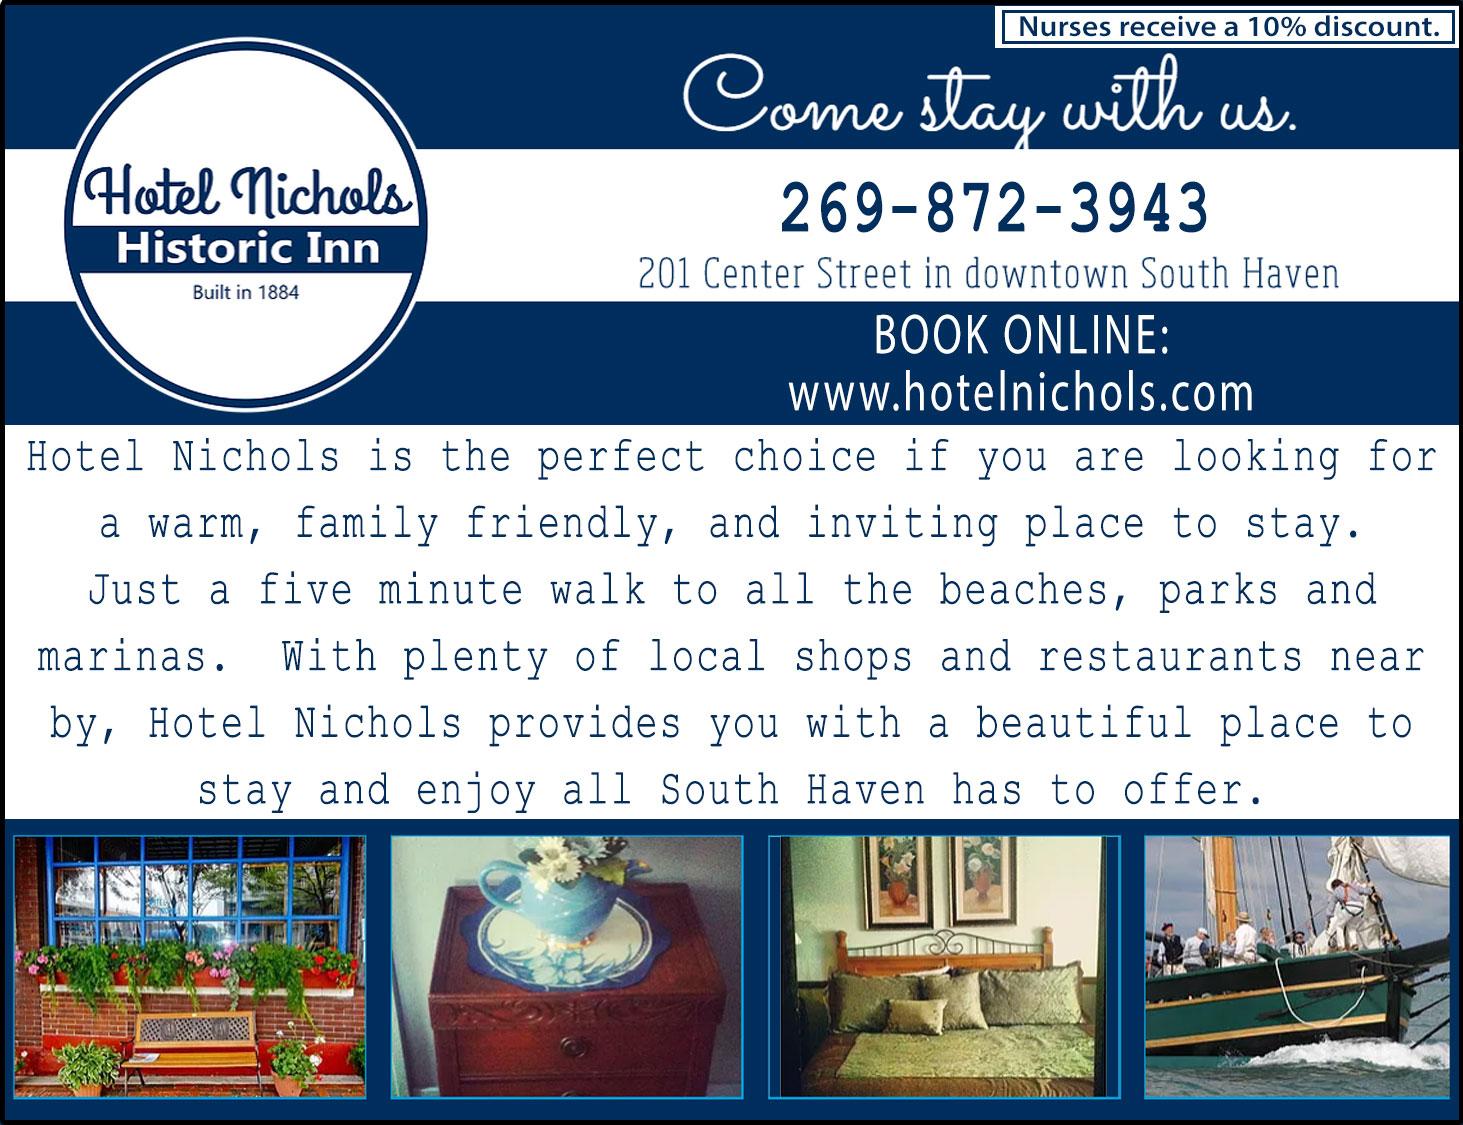 Hotel Nichols